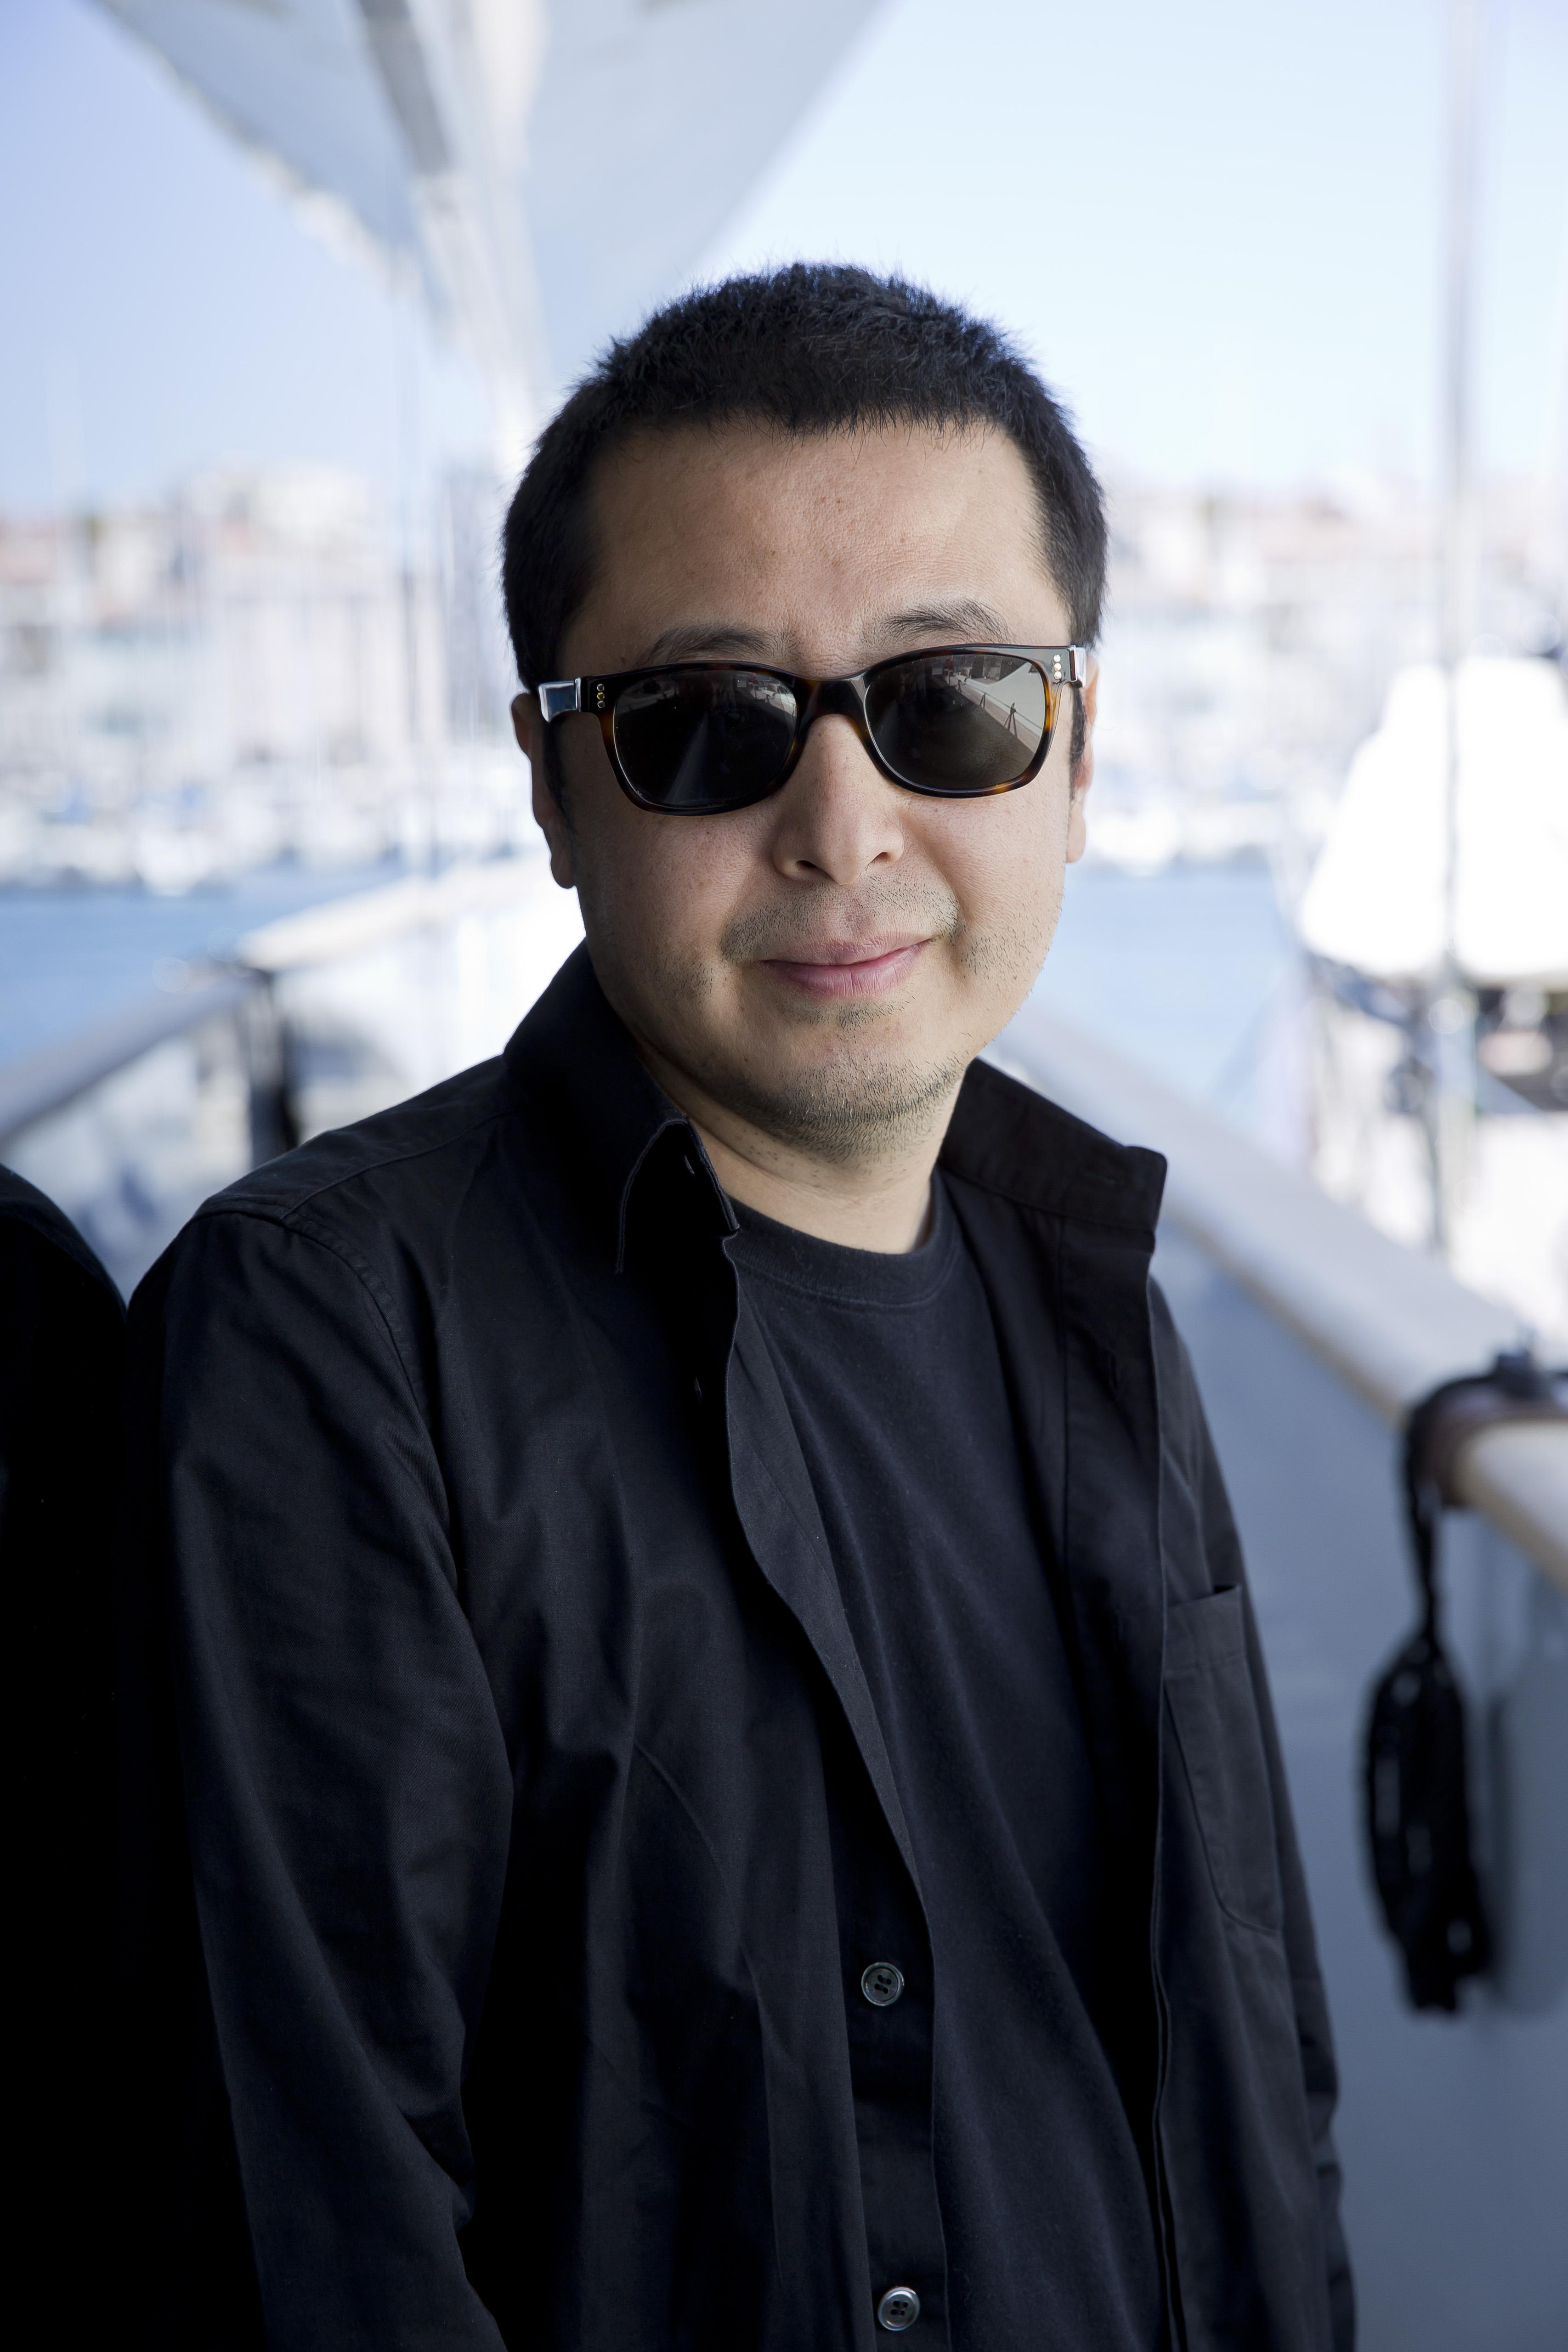 Jia Zhangke par Paul Blind, Cannes 2015